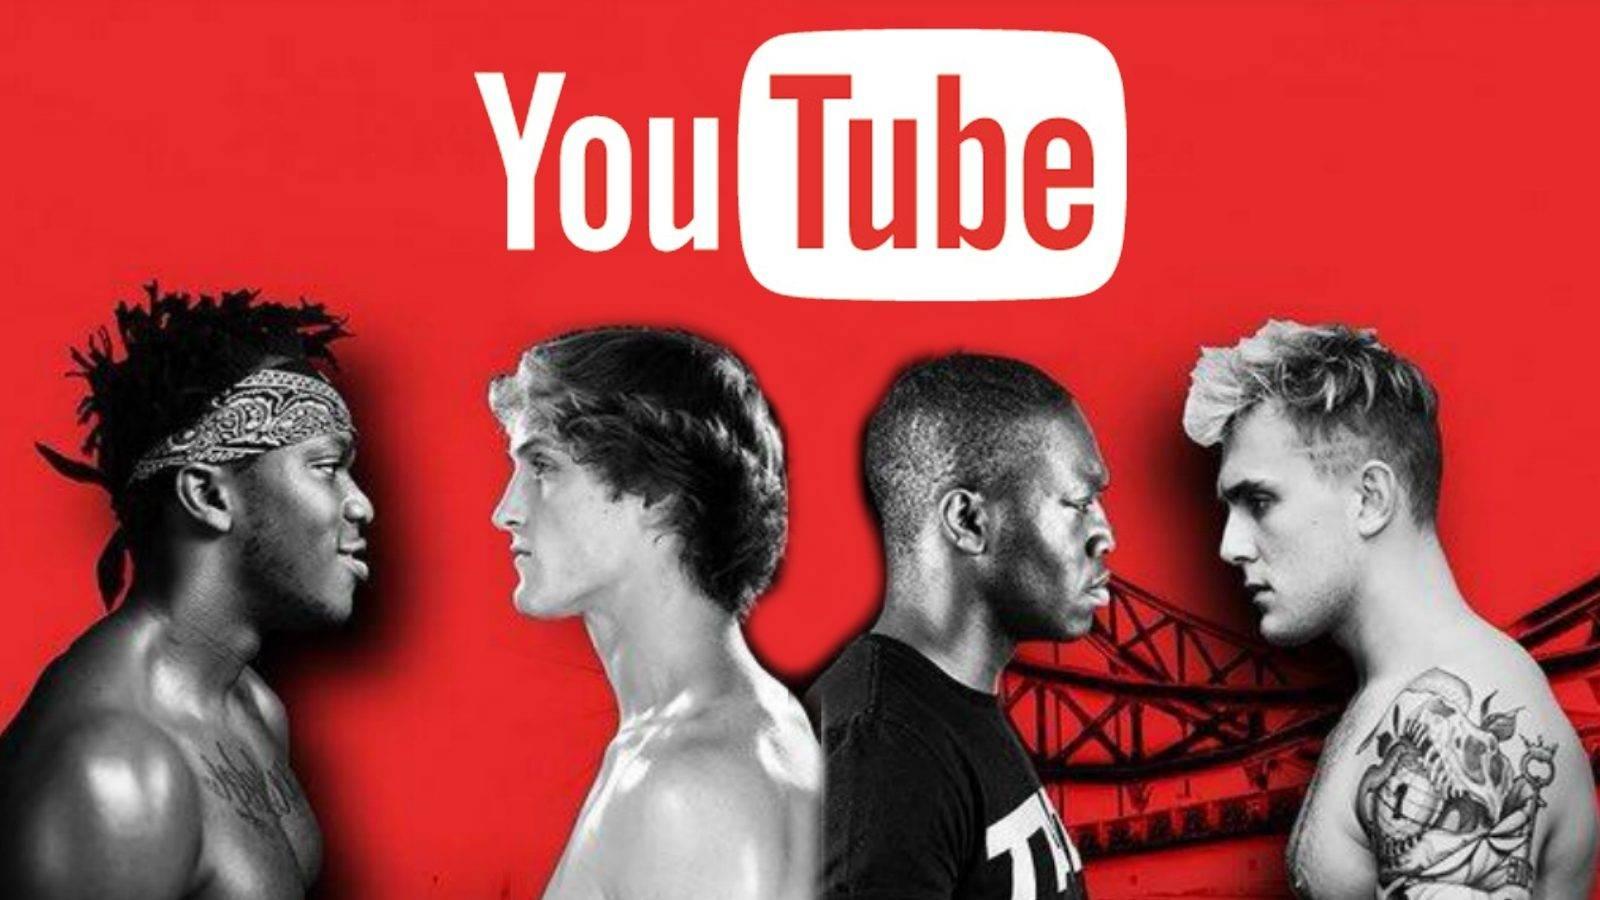 Ksi Vs Logan Live Stream